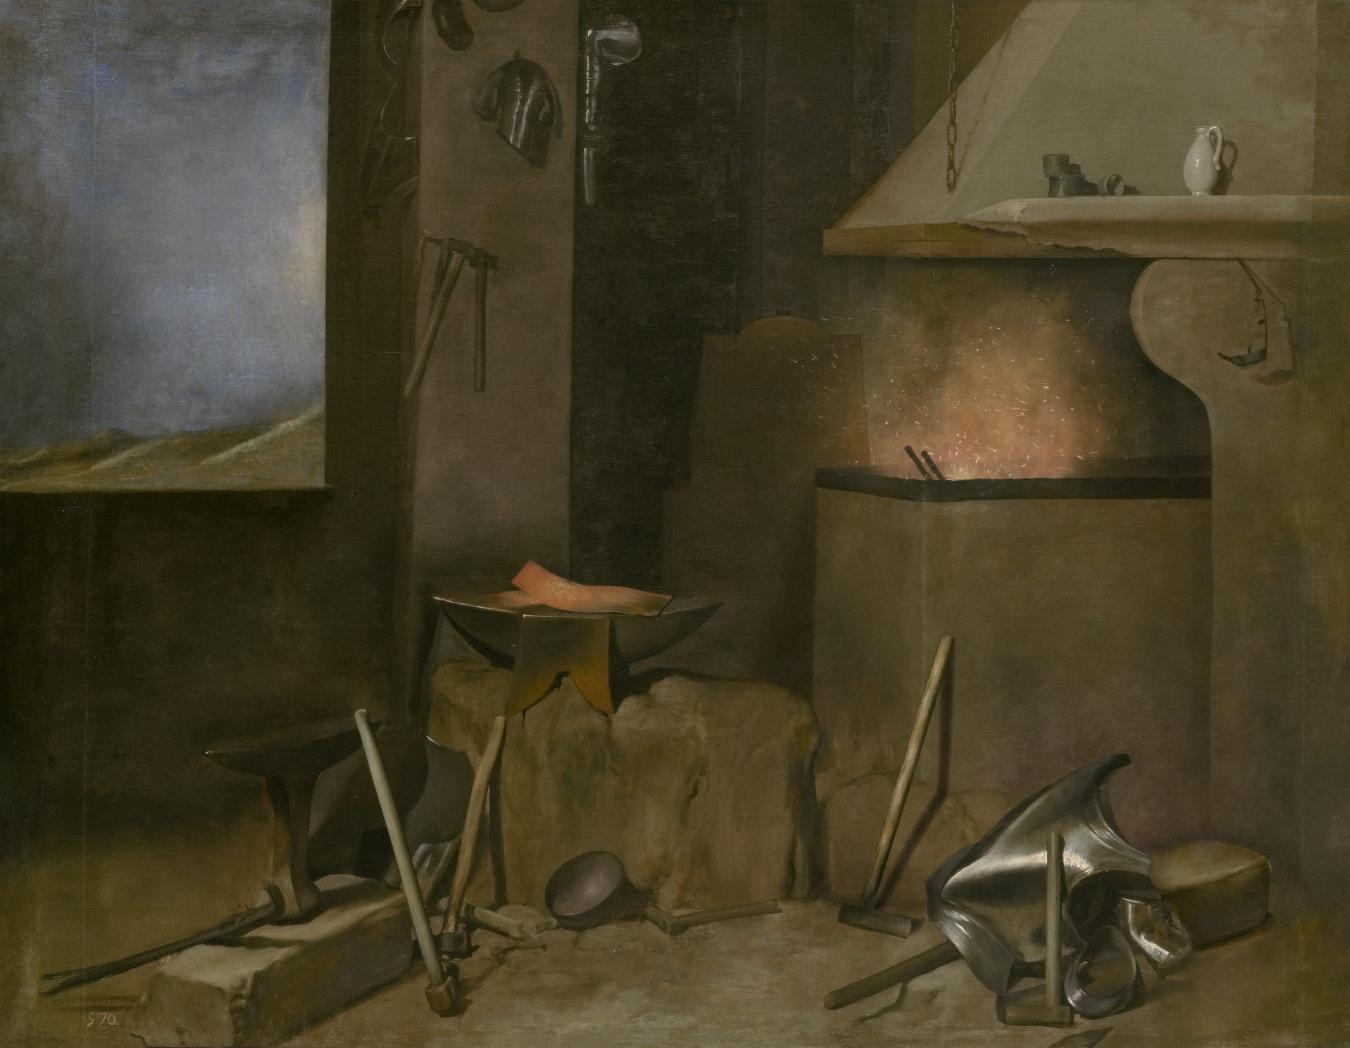 """La fragua de Vulcano"" de Velázquez - TIENDA - Tienda David Bokeh"